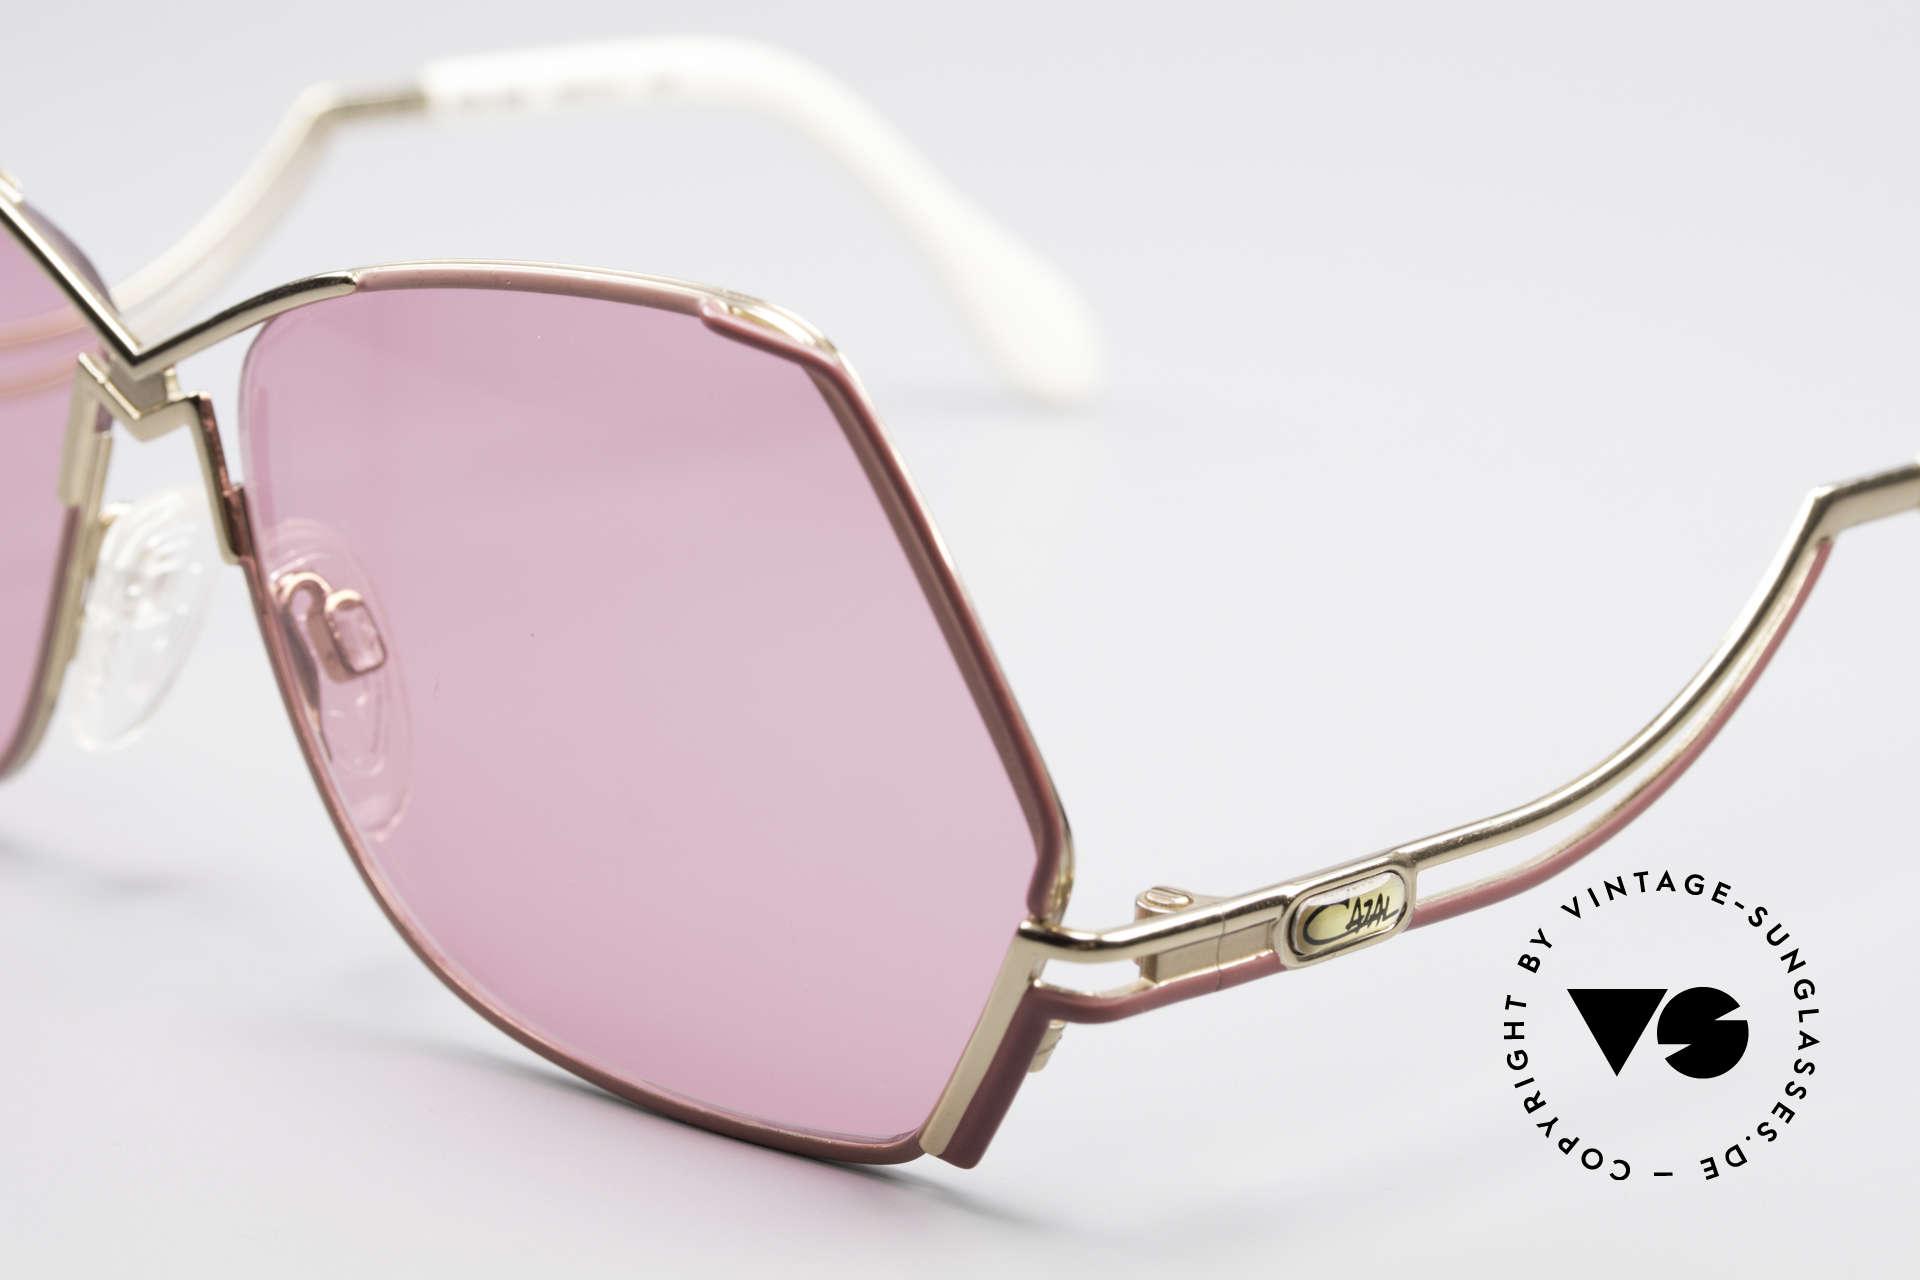 Cazal 226 Pinke Sonnenbrille Damen, 80er Rahmen (W.Germany), 90er = made in Germany, Passend für Damen